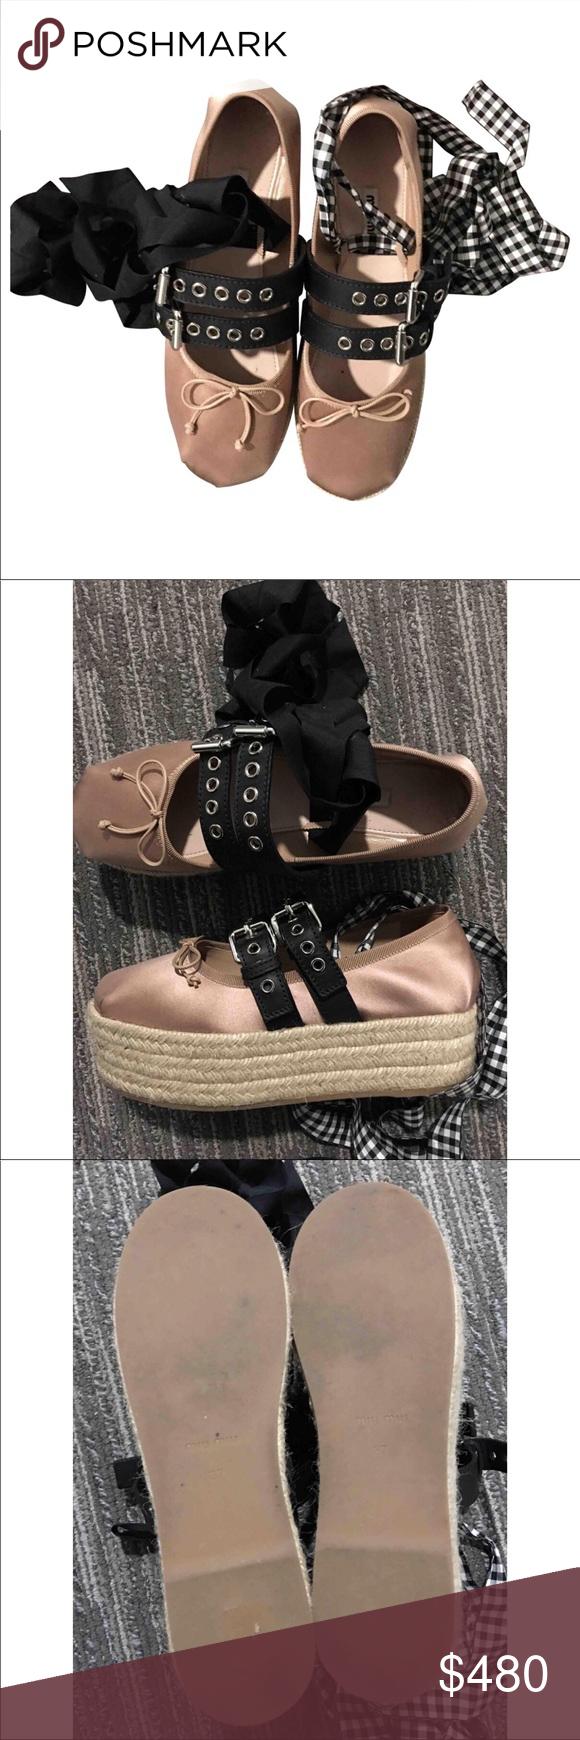 ae115494b30c Miu Miu ballerina platform shoes authentic Worn once. In great condition. Miu  Miu Shoes Espadrilles